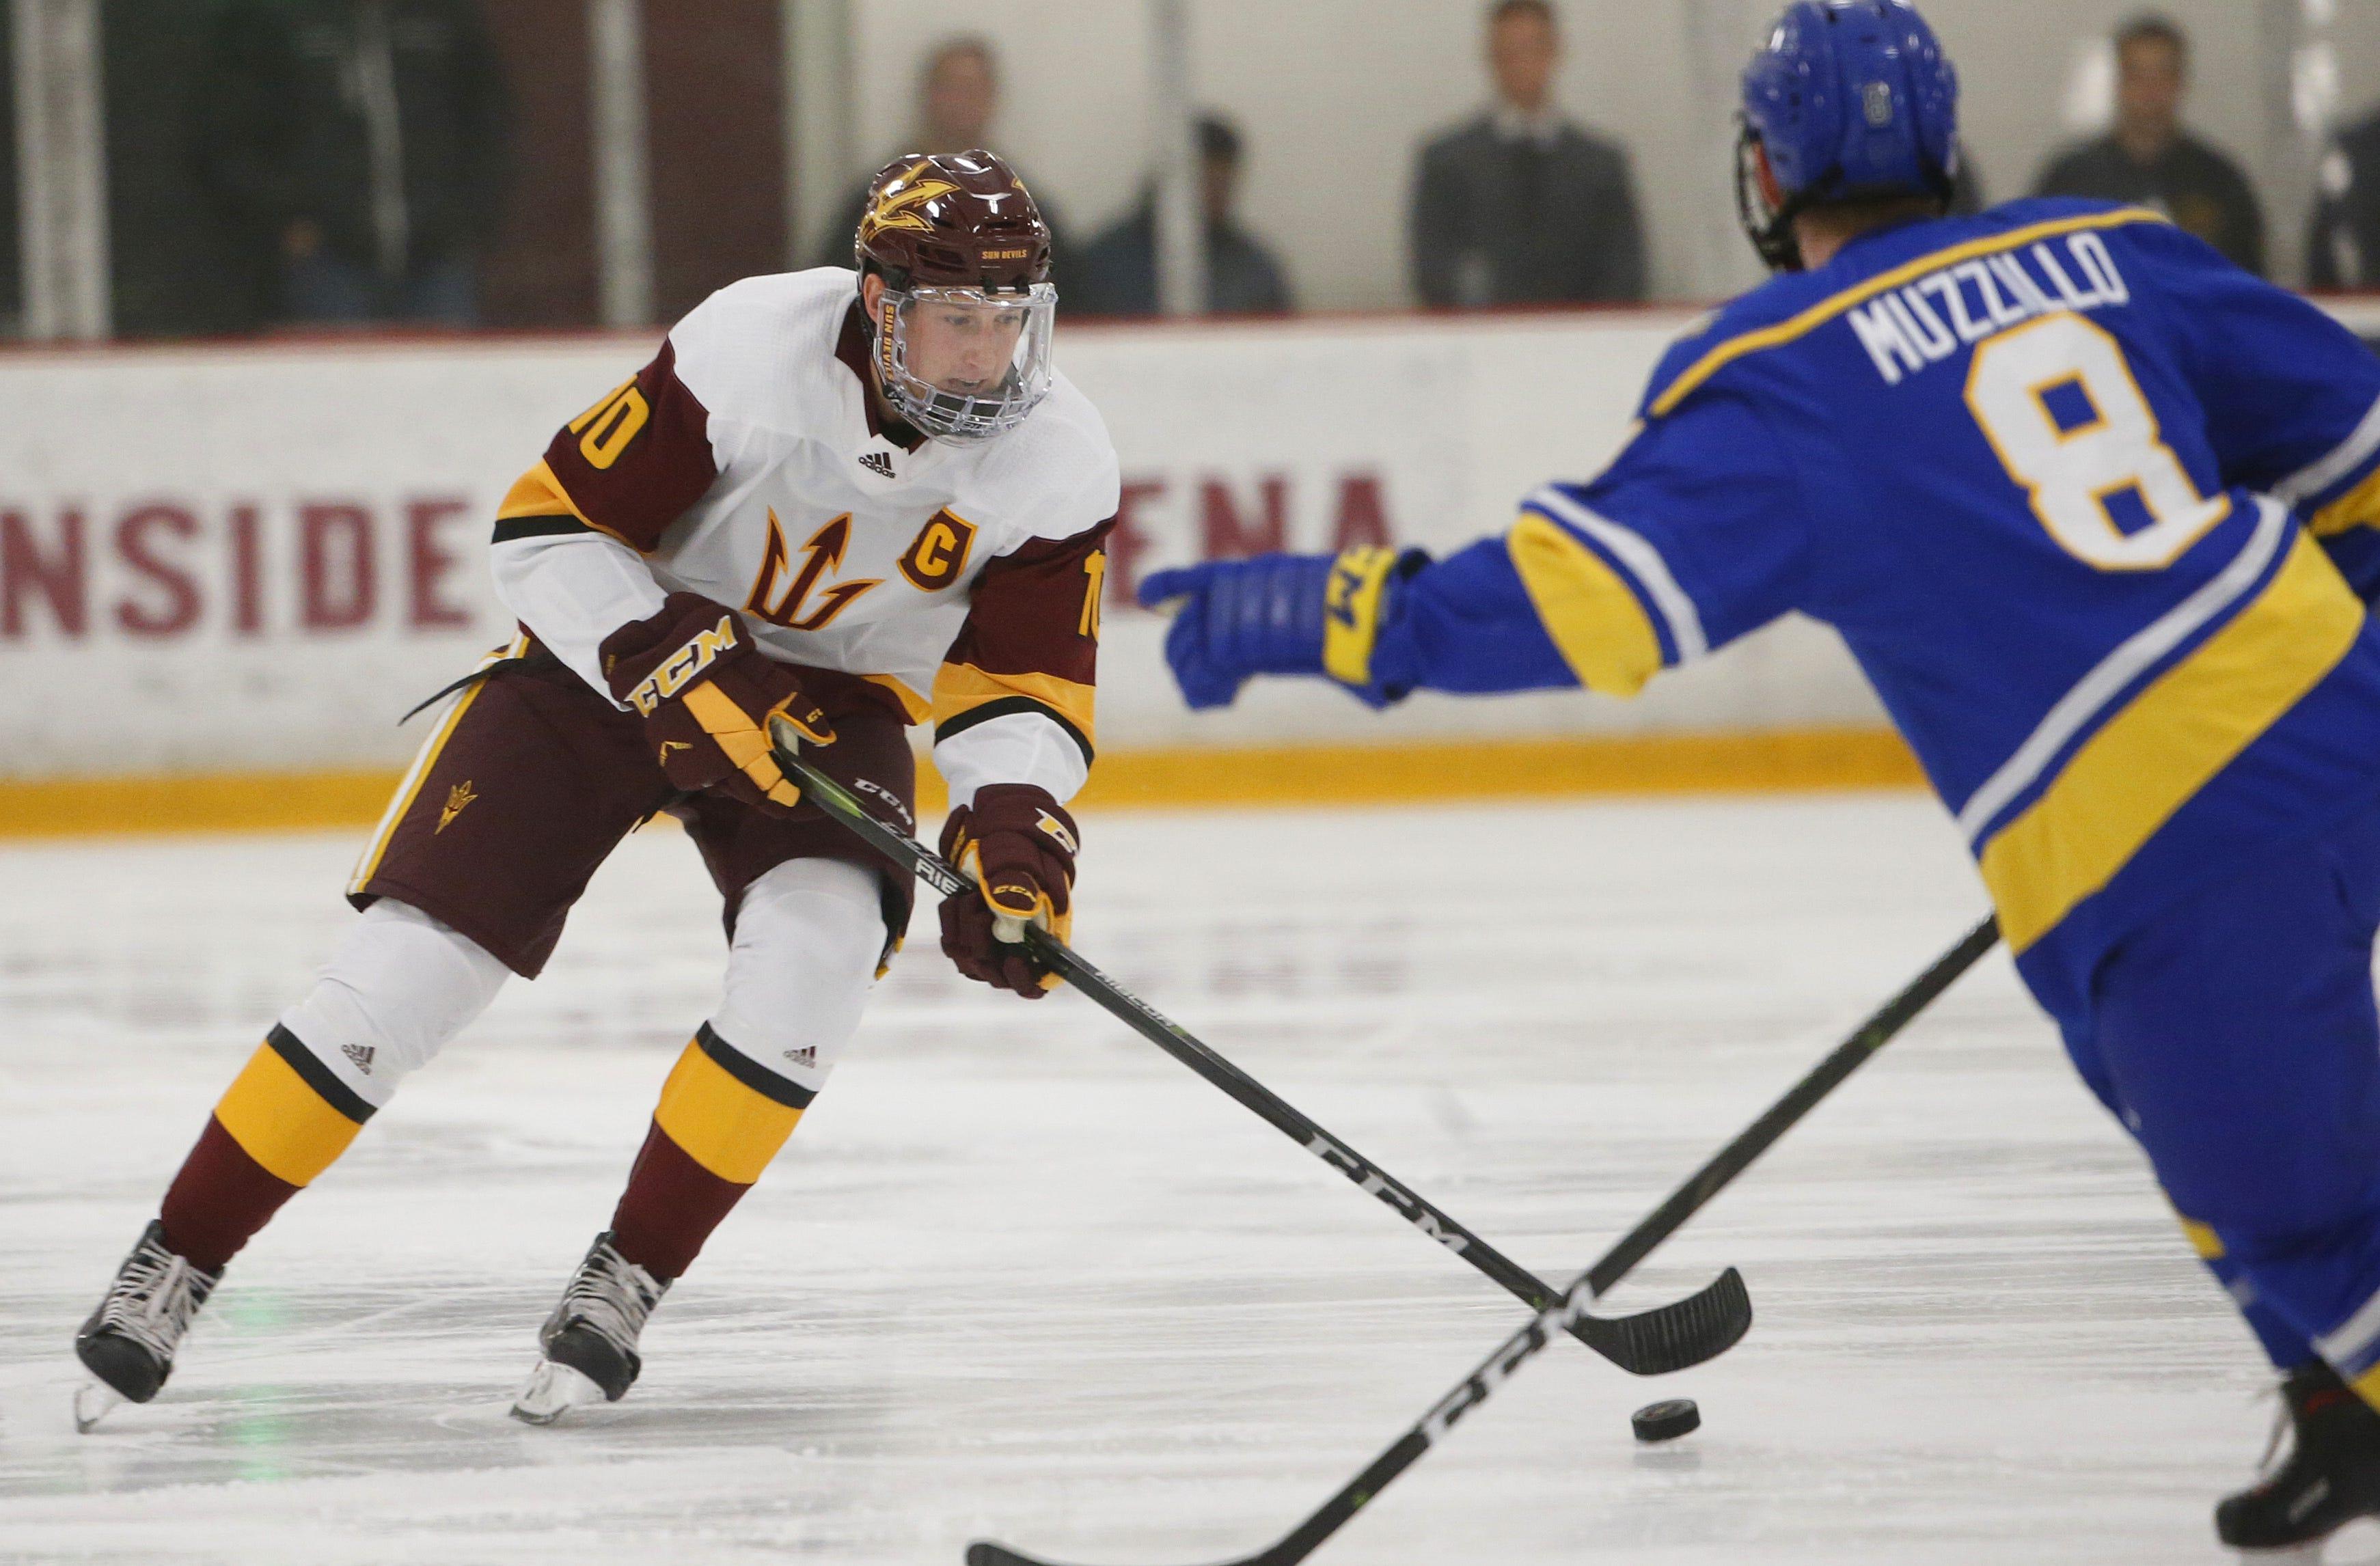 Arizona State's Johnny Walker Leads College Hockey In Goal Scoring